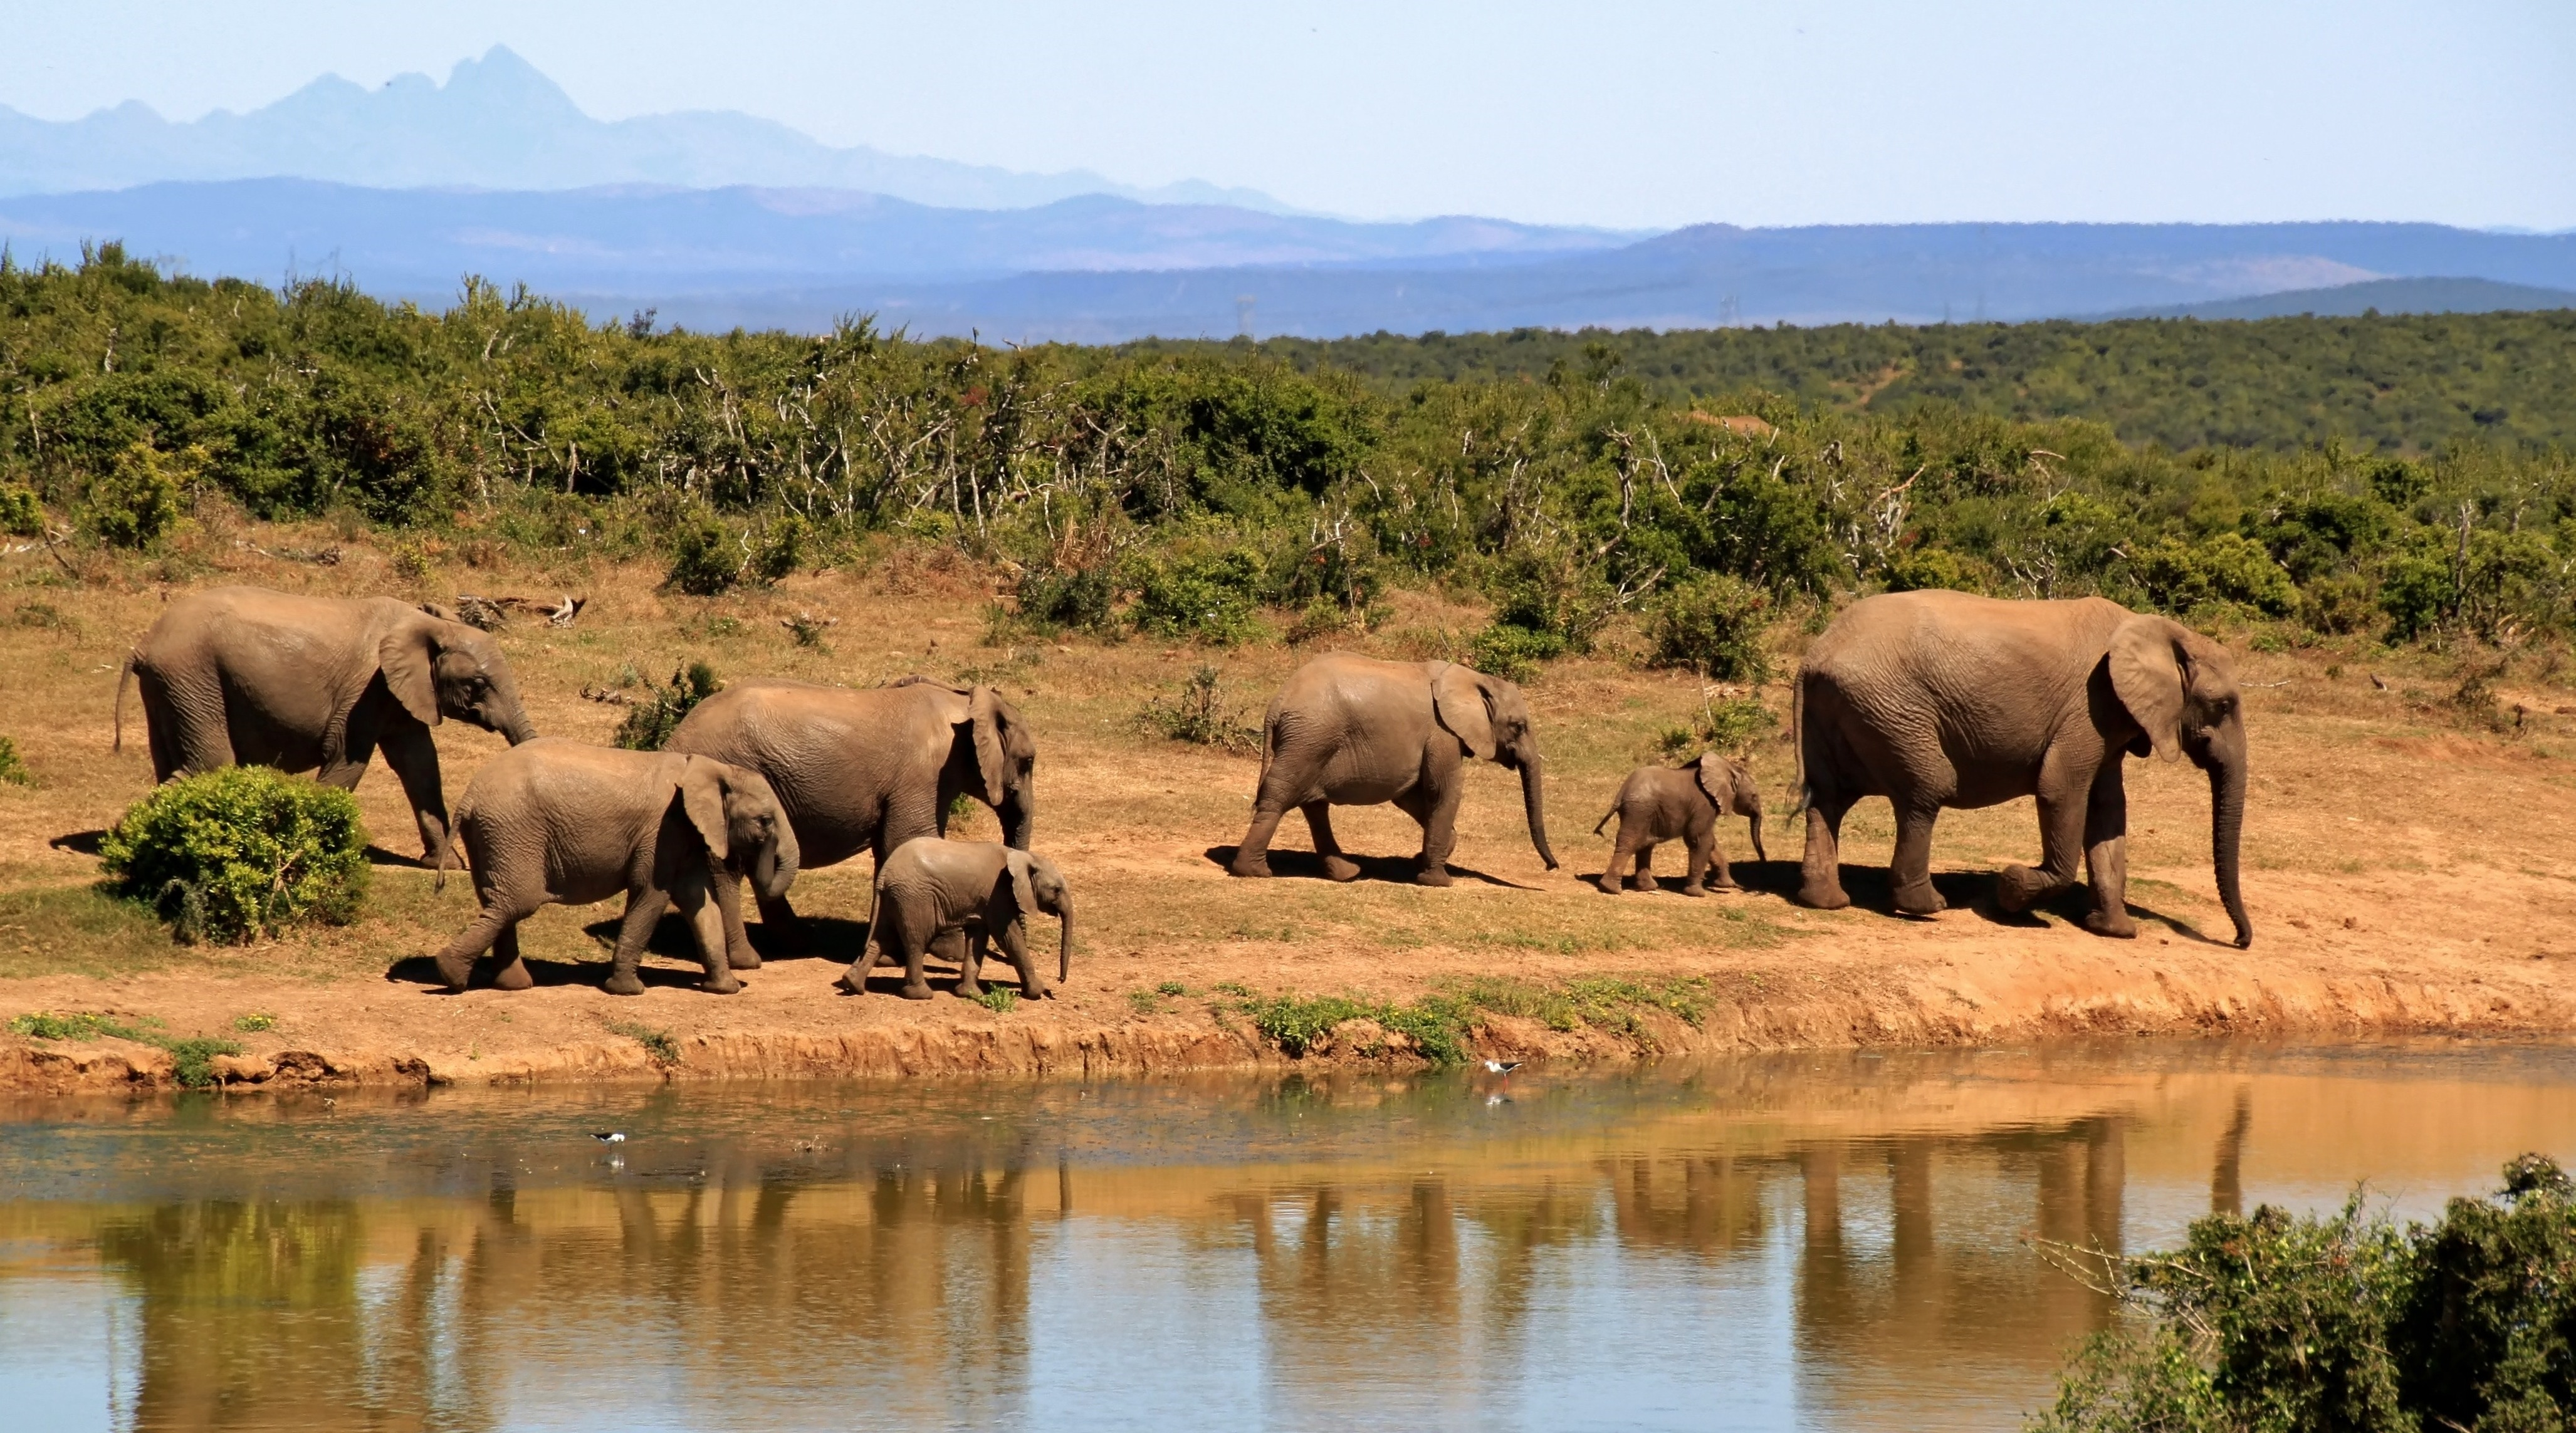 7 elephants walking beside body of water during daytime free